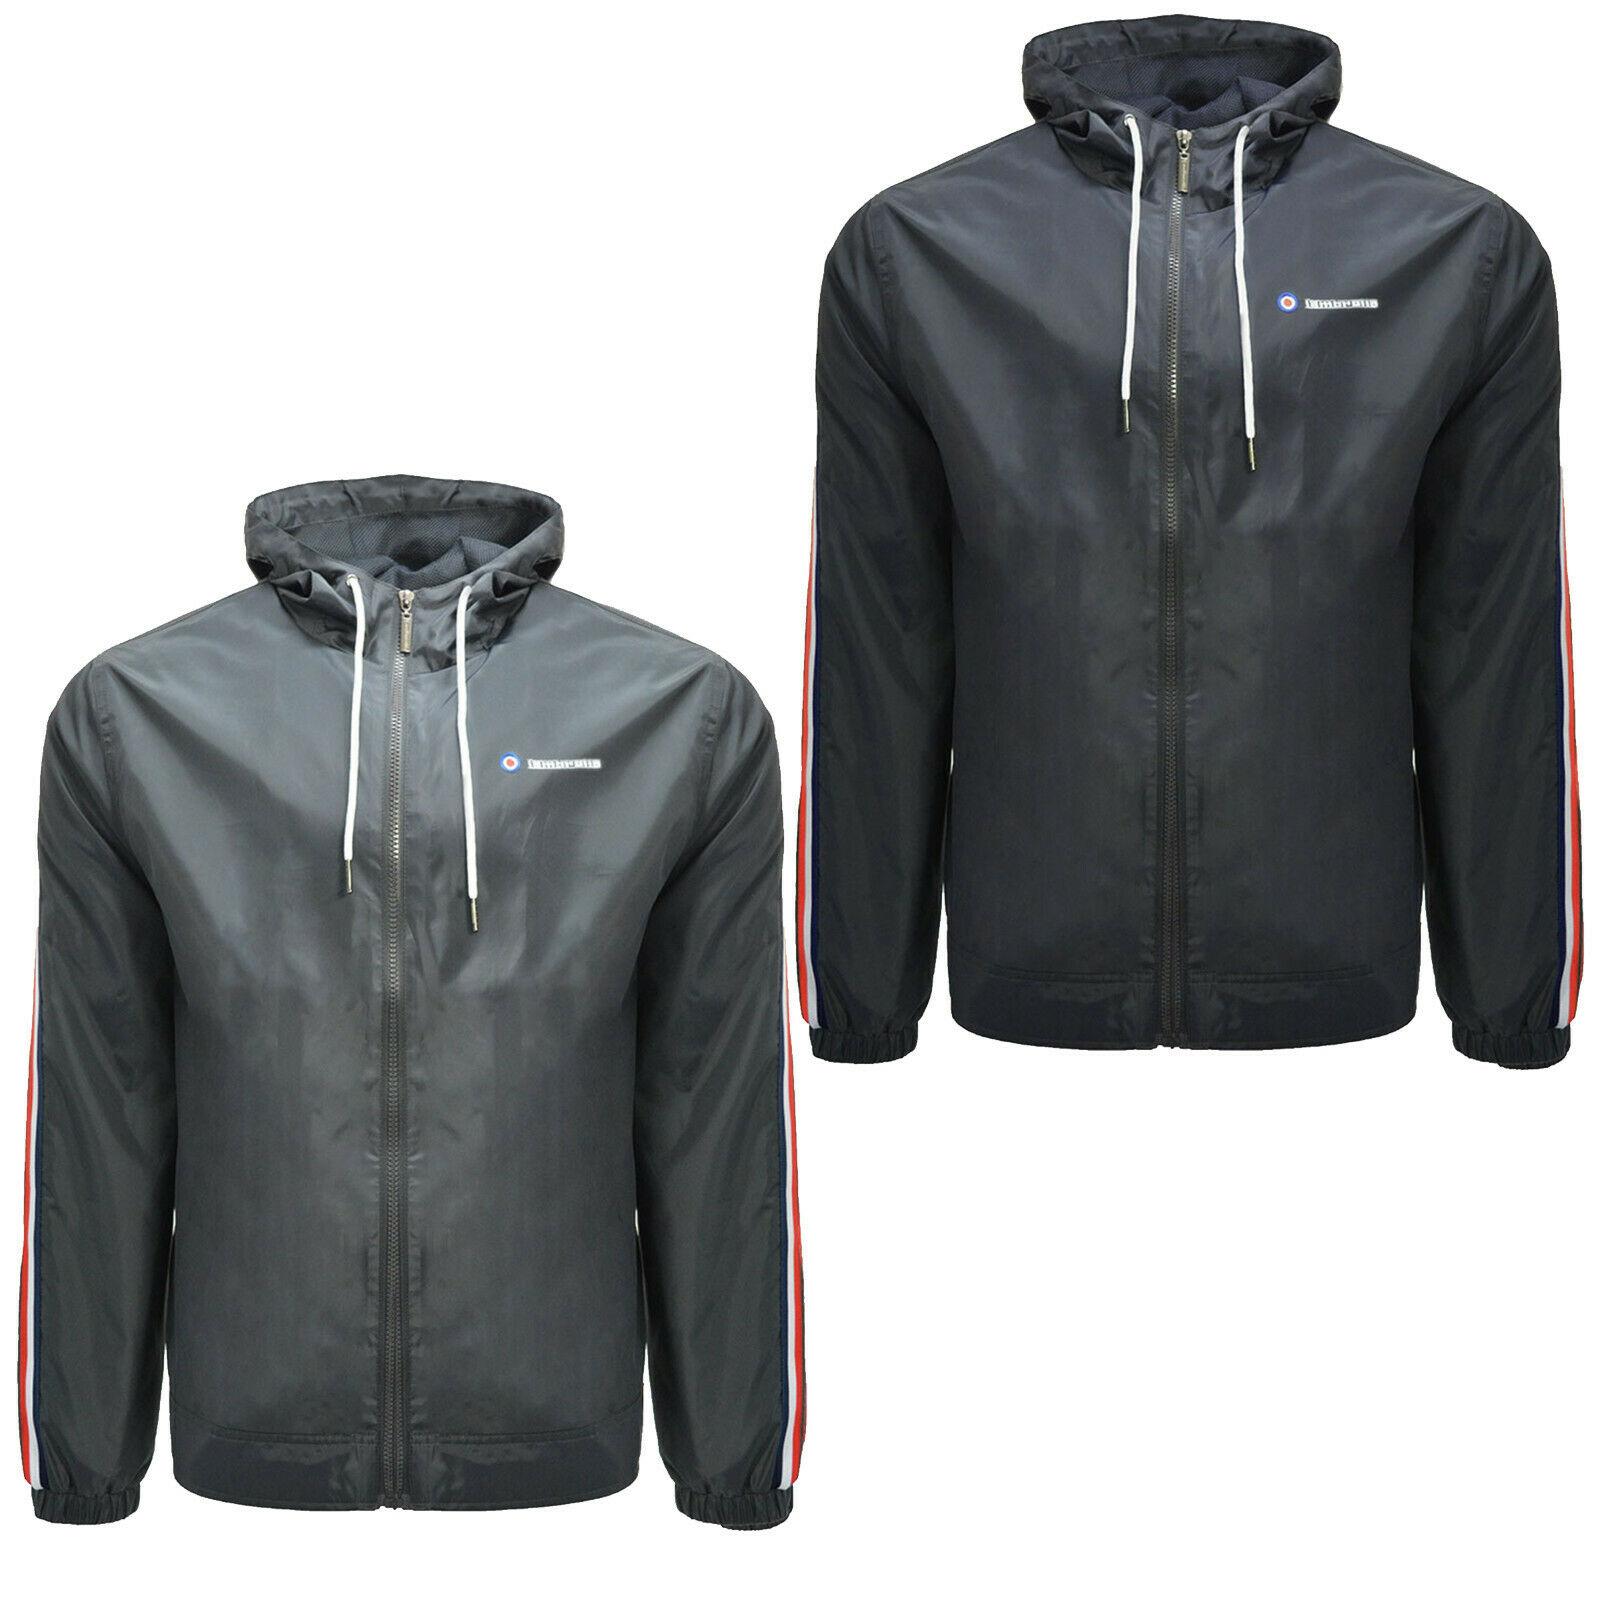 Mens Lambretta Tracksuit Top Jacket Zip Up Retro Jacket Coat Sizes M to 4XL